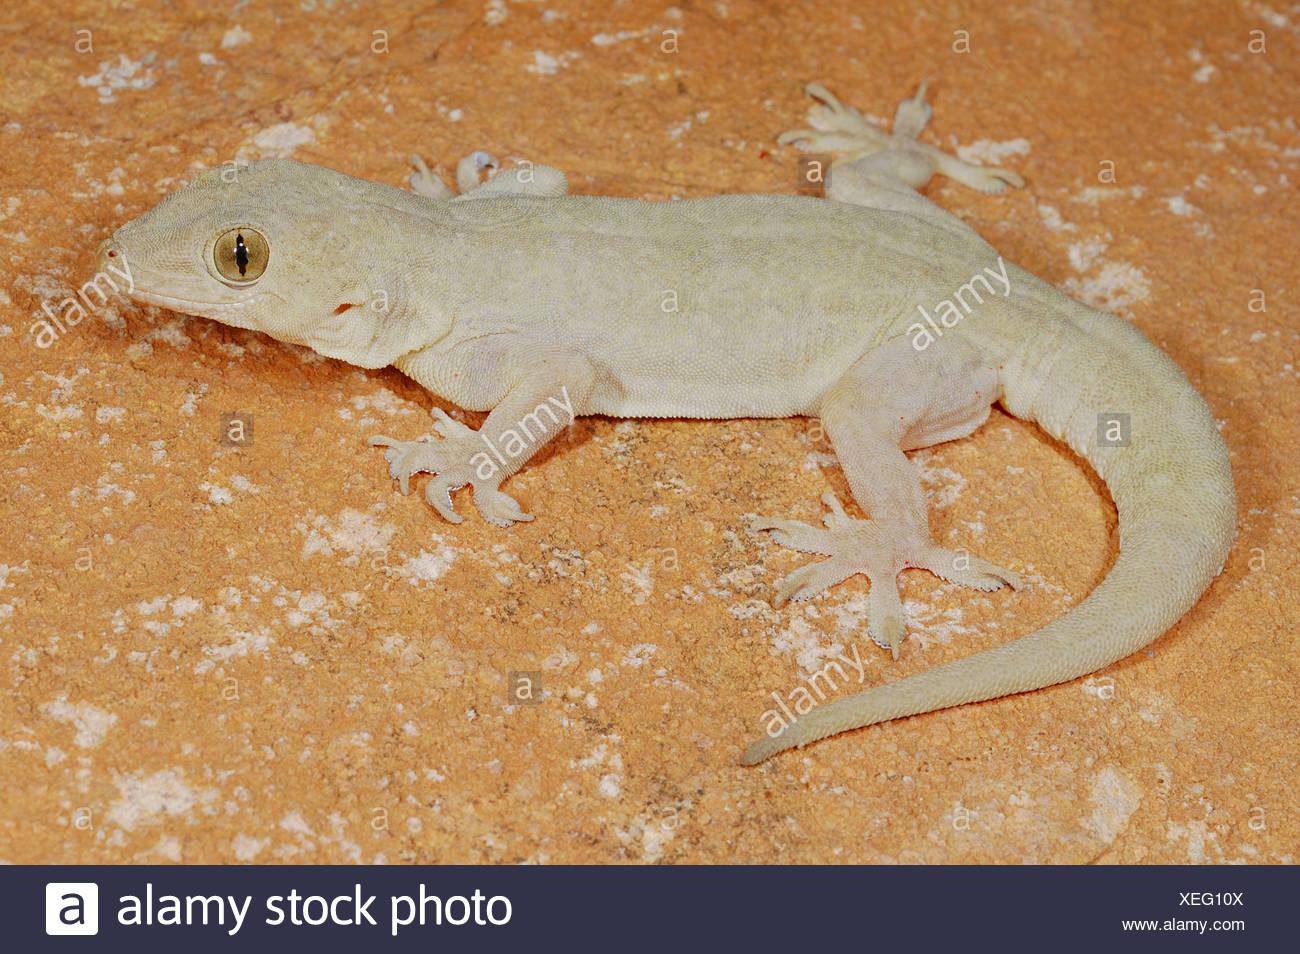 hemidactylus-flaviviridis-gecko-socotra-reptiles-vertebrates-lizard-lizards-reptile-reptiles-animal-animals-gecko-geckos-asia-XEG10X.jpg